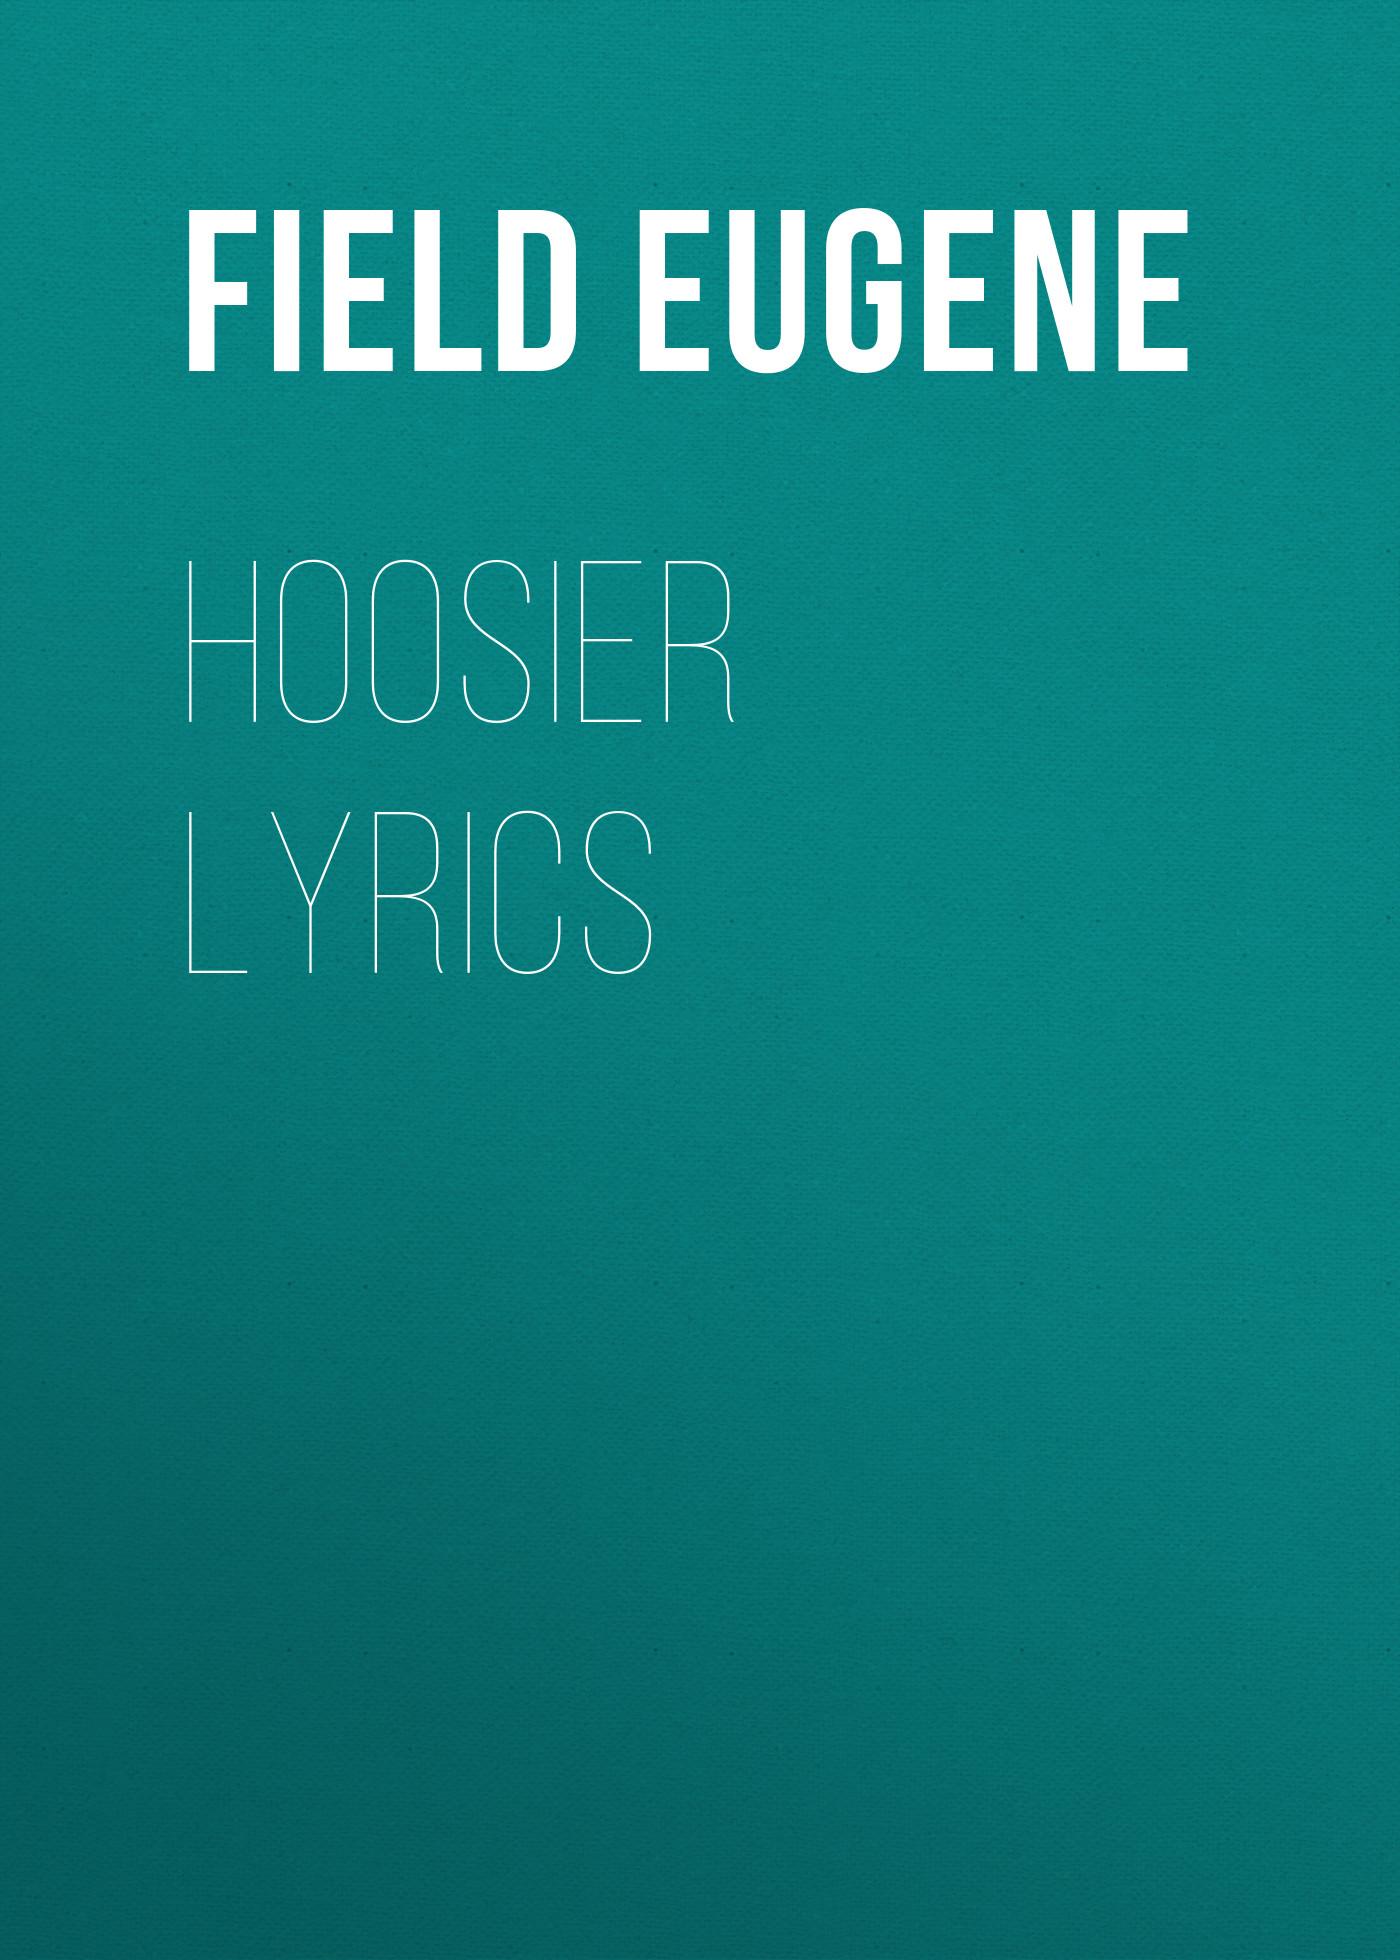 Field Eugene Hoosier Lyrics